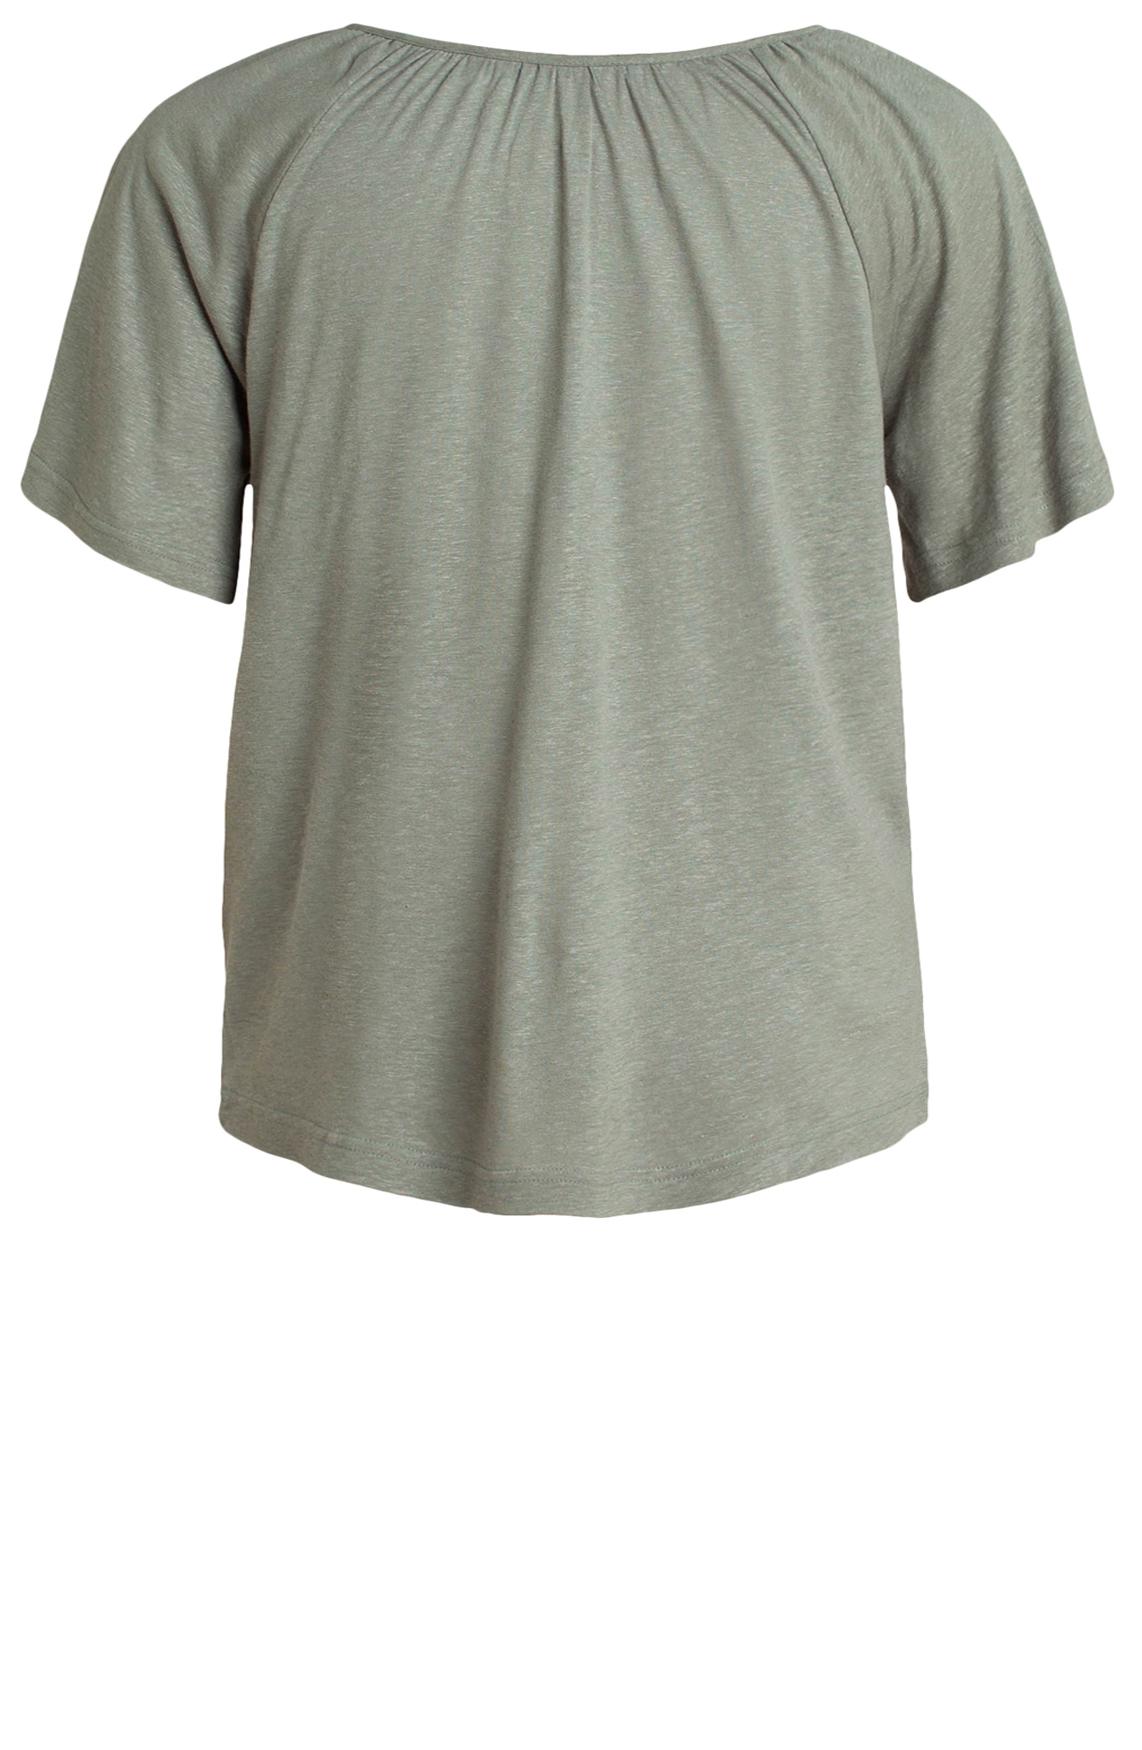 Moscow Dames Shirt met V-hals groen